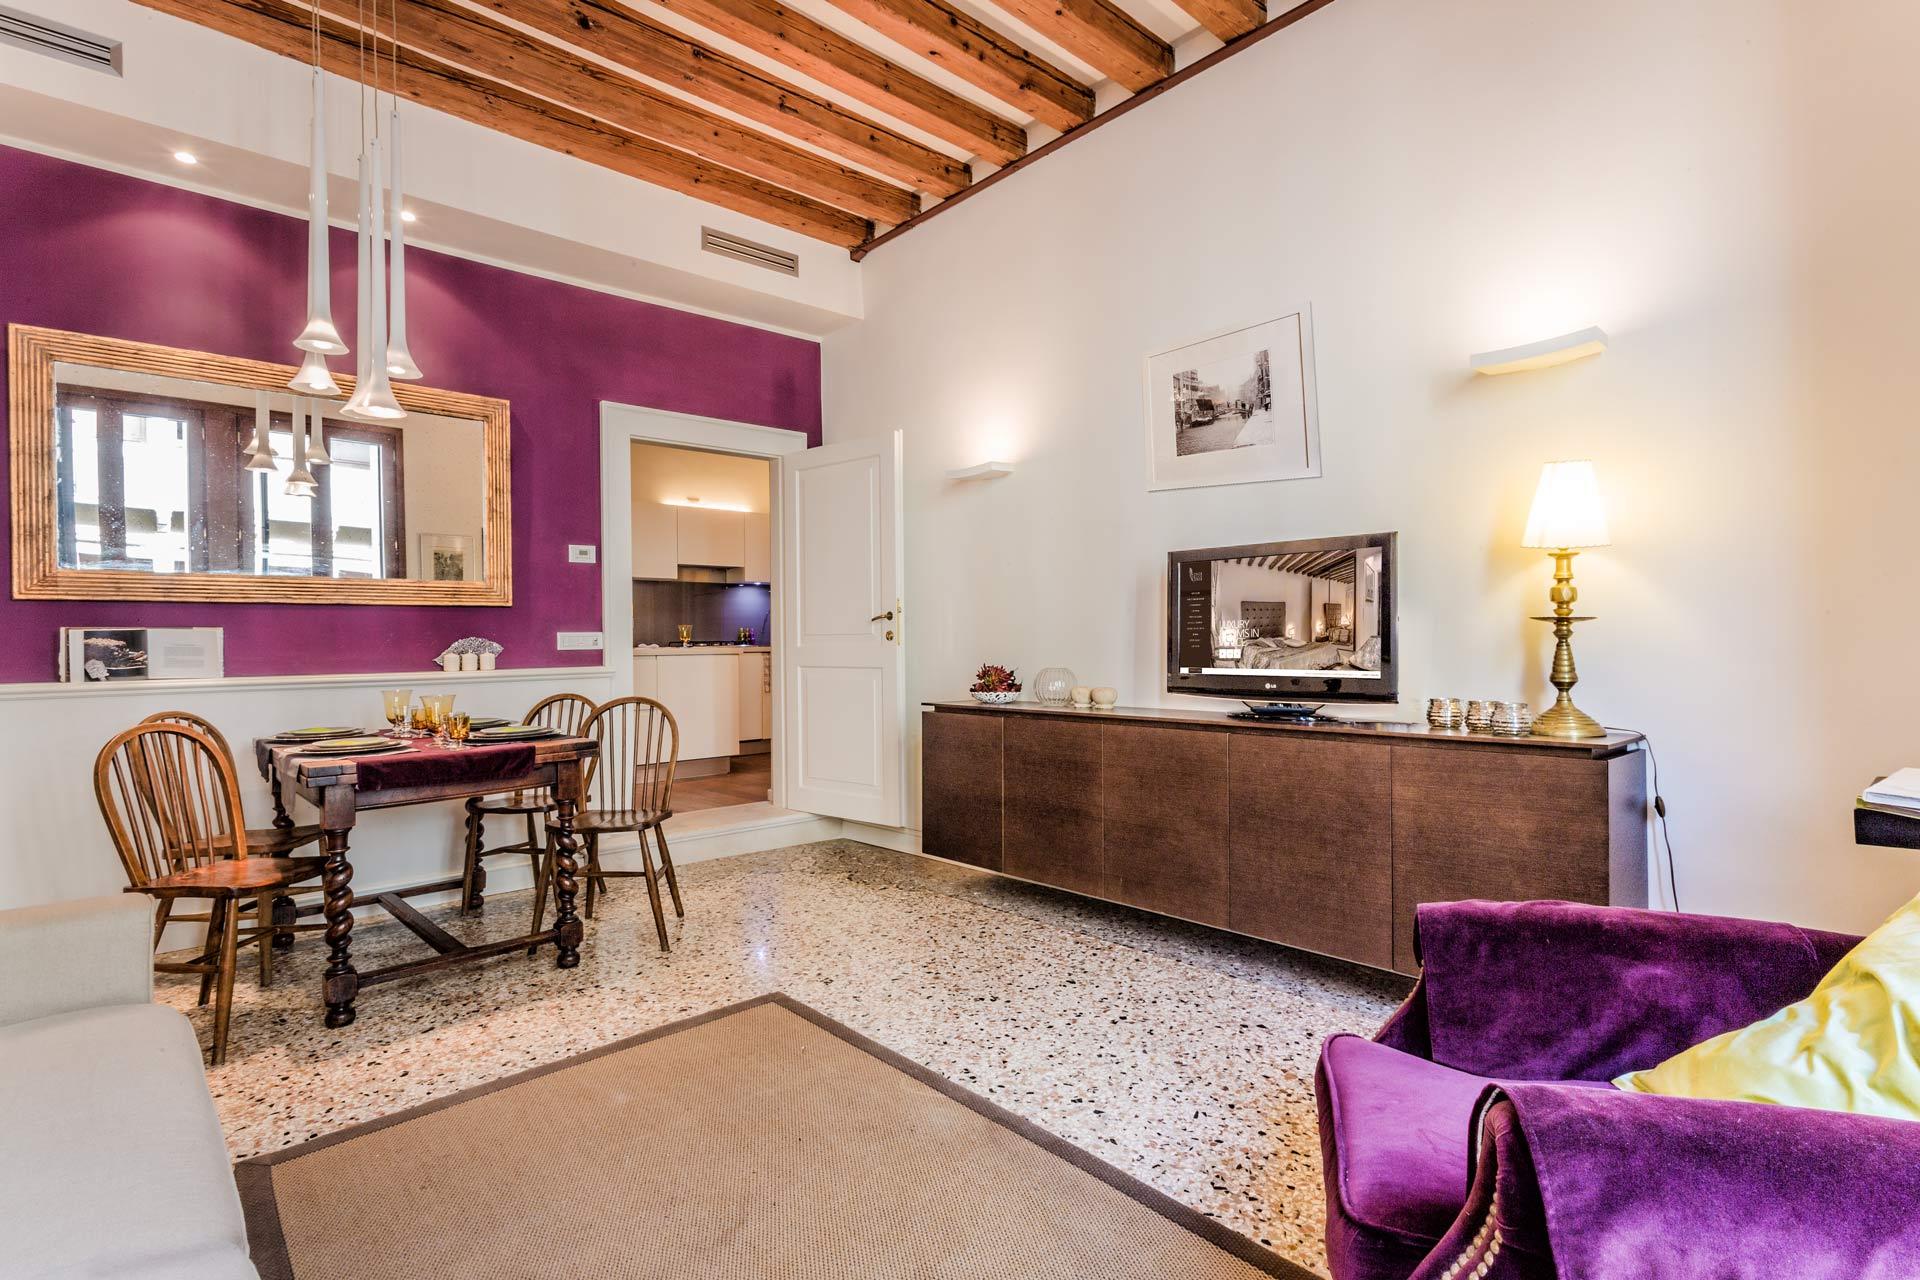 Turandot - Venice Dream House Apartments